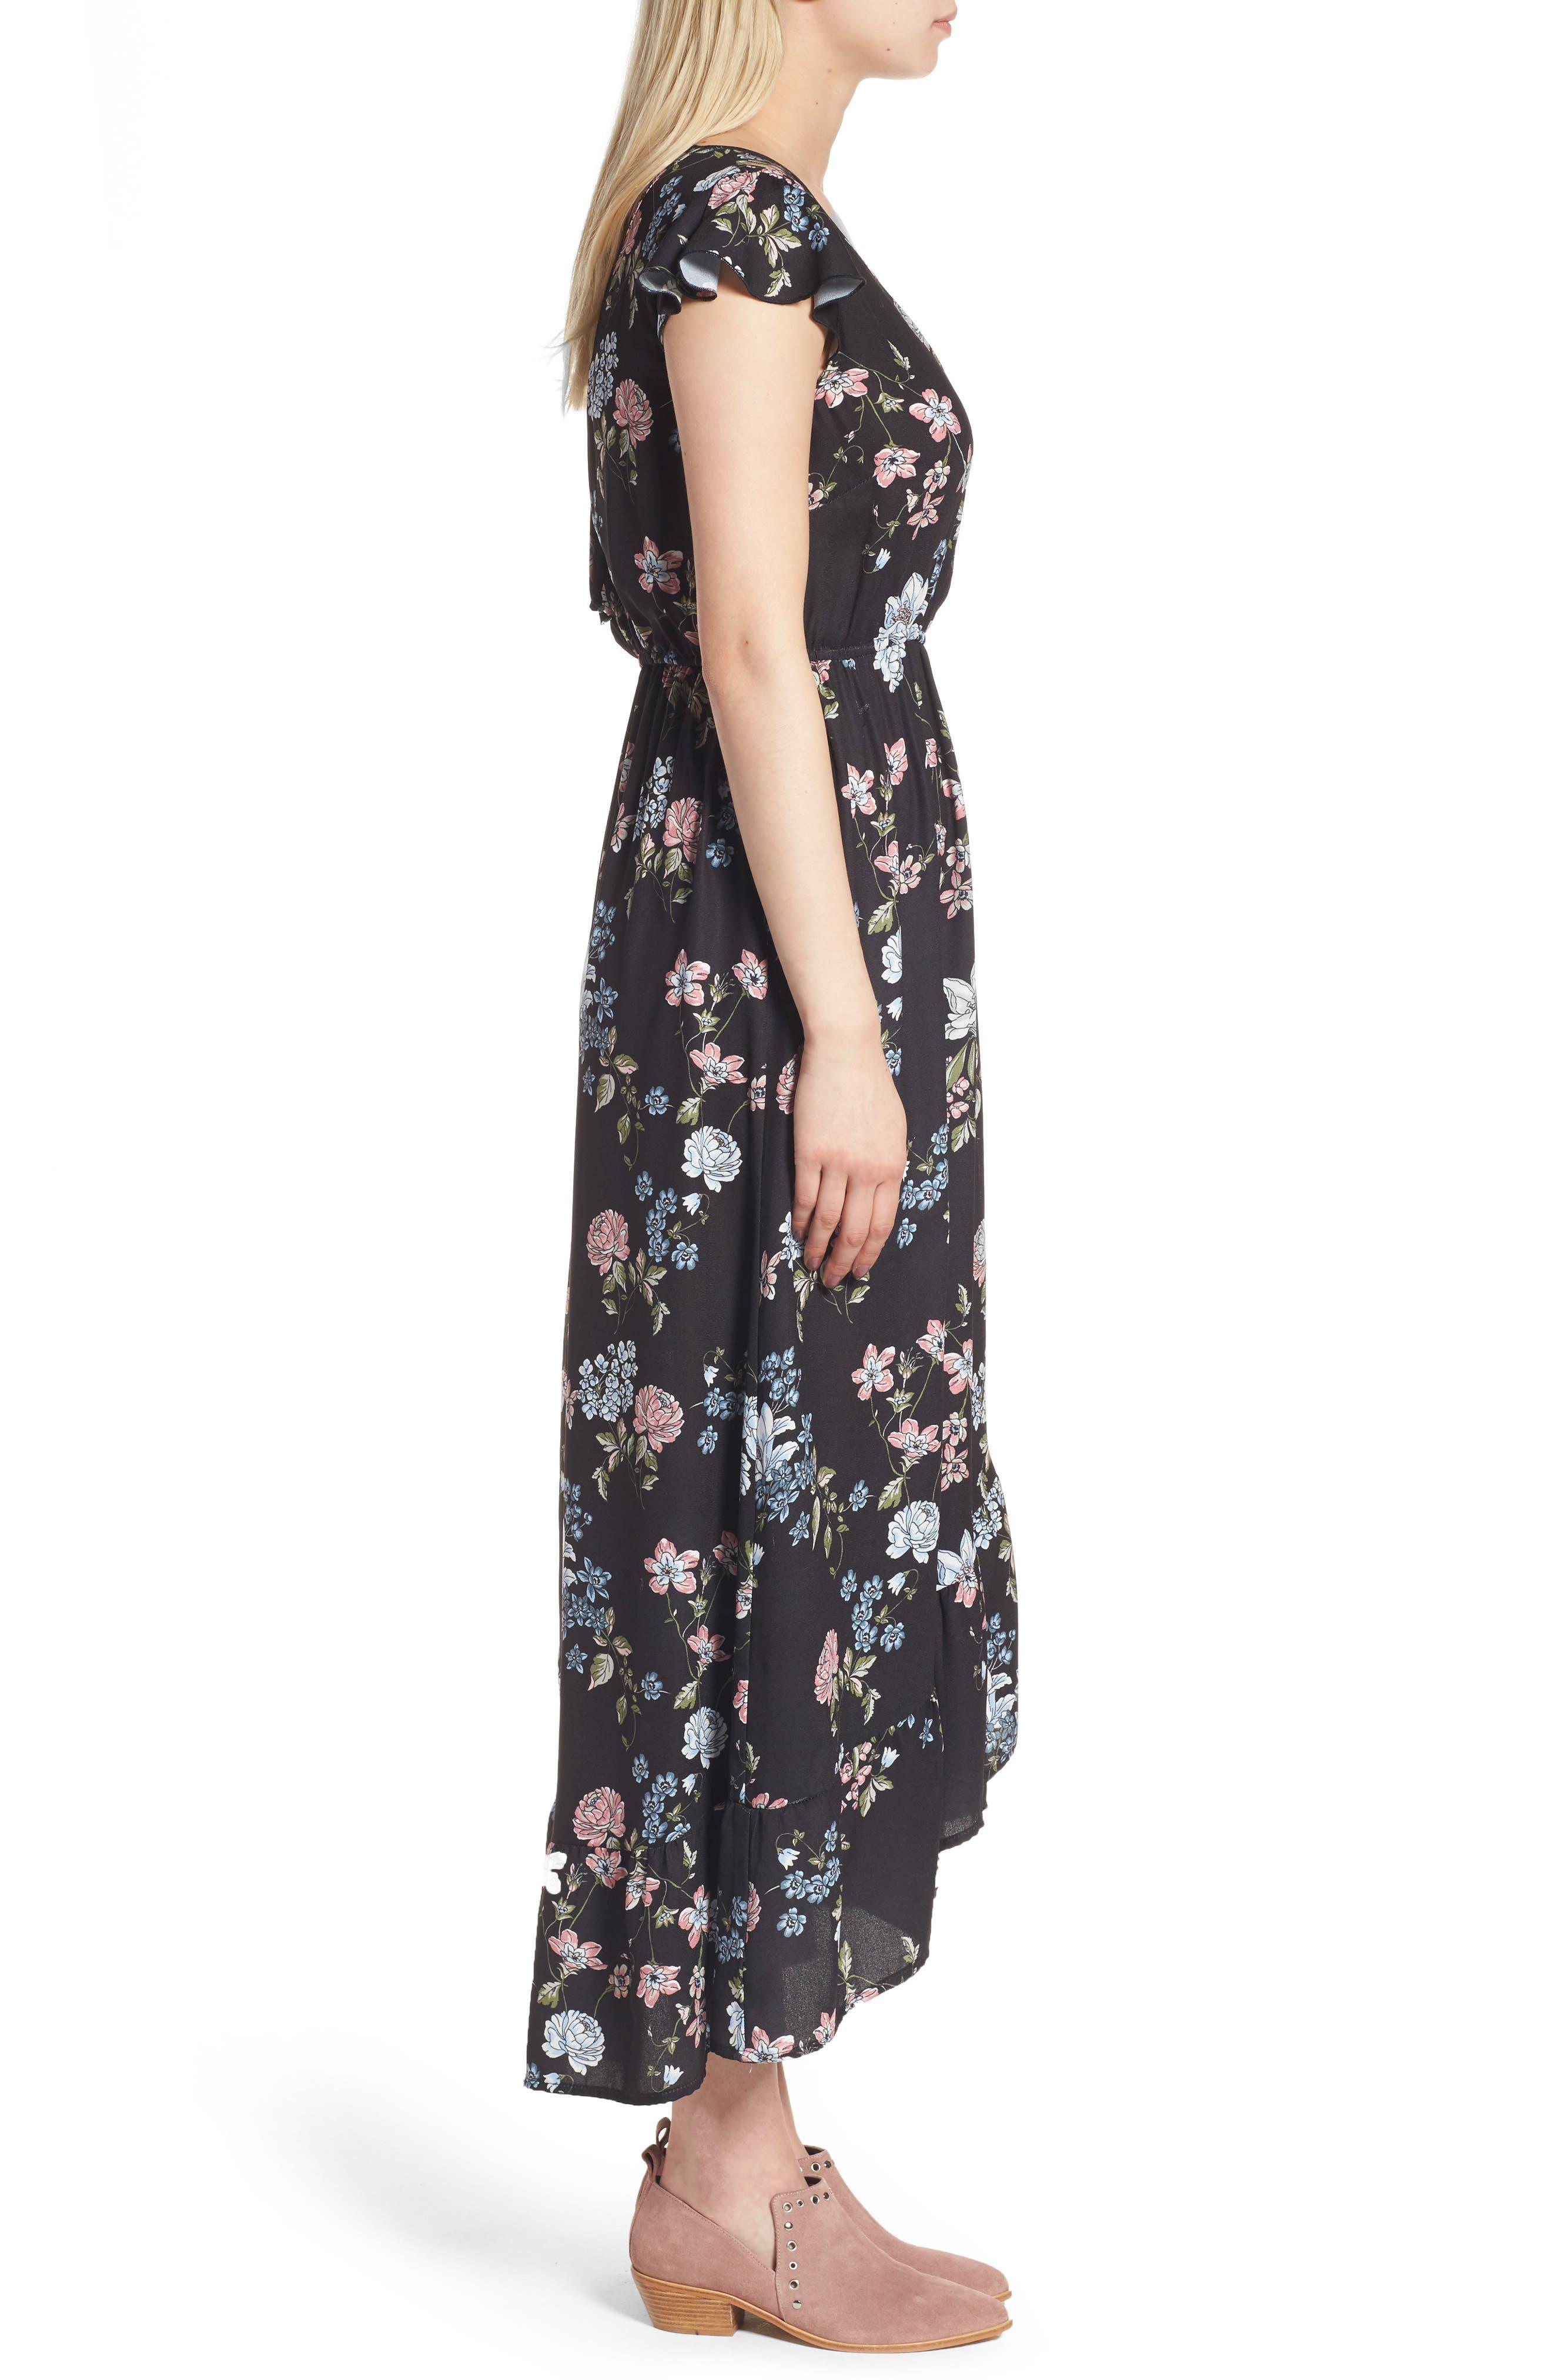 BAND OF GYPSIES, Faux Wrap Maxi Dress, Alternate thumbnail 3, color, 004